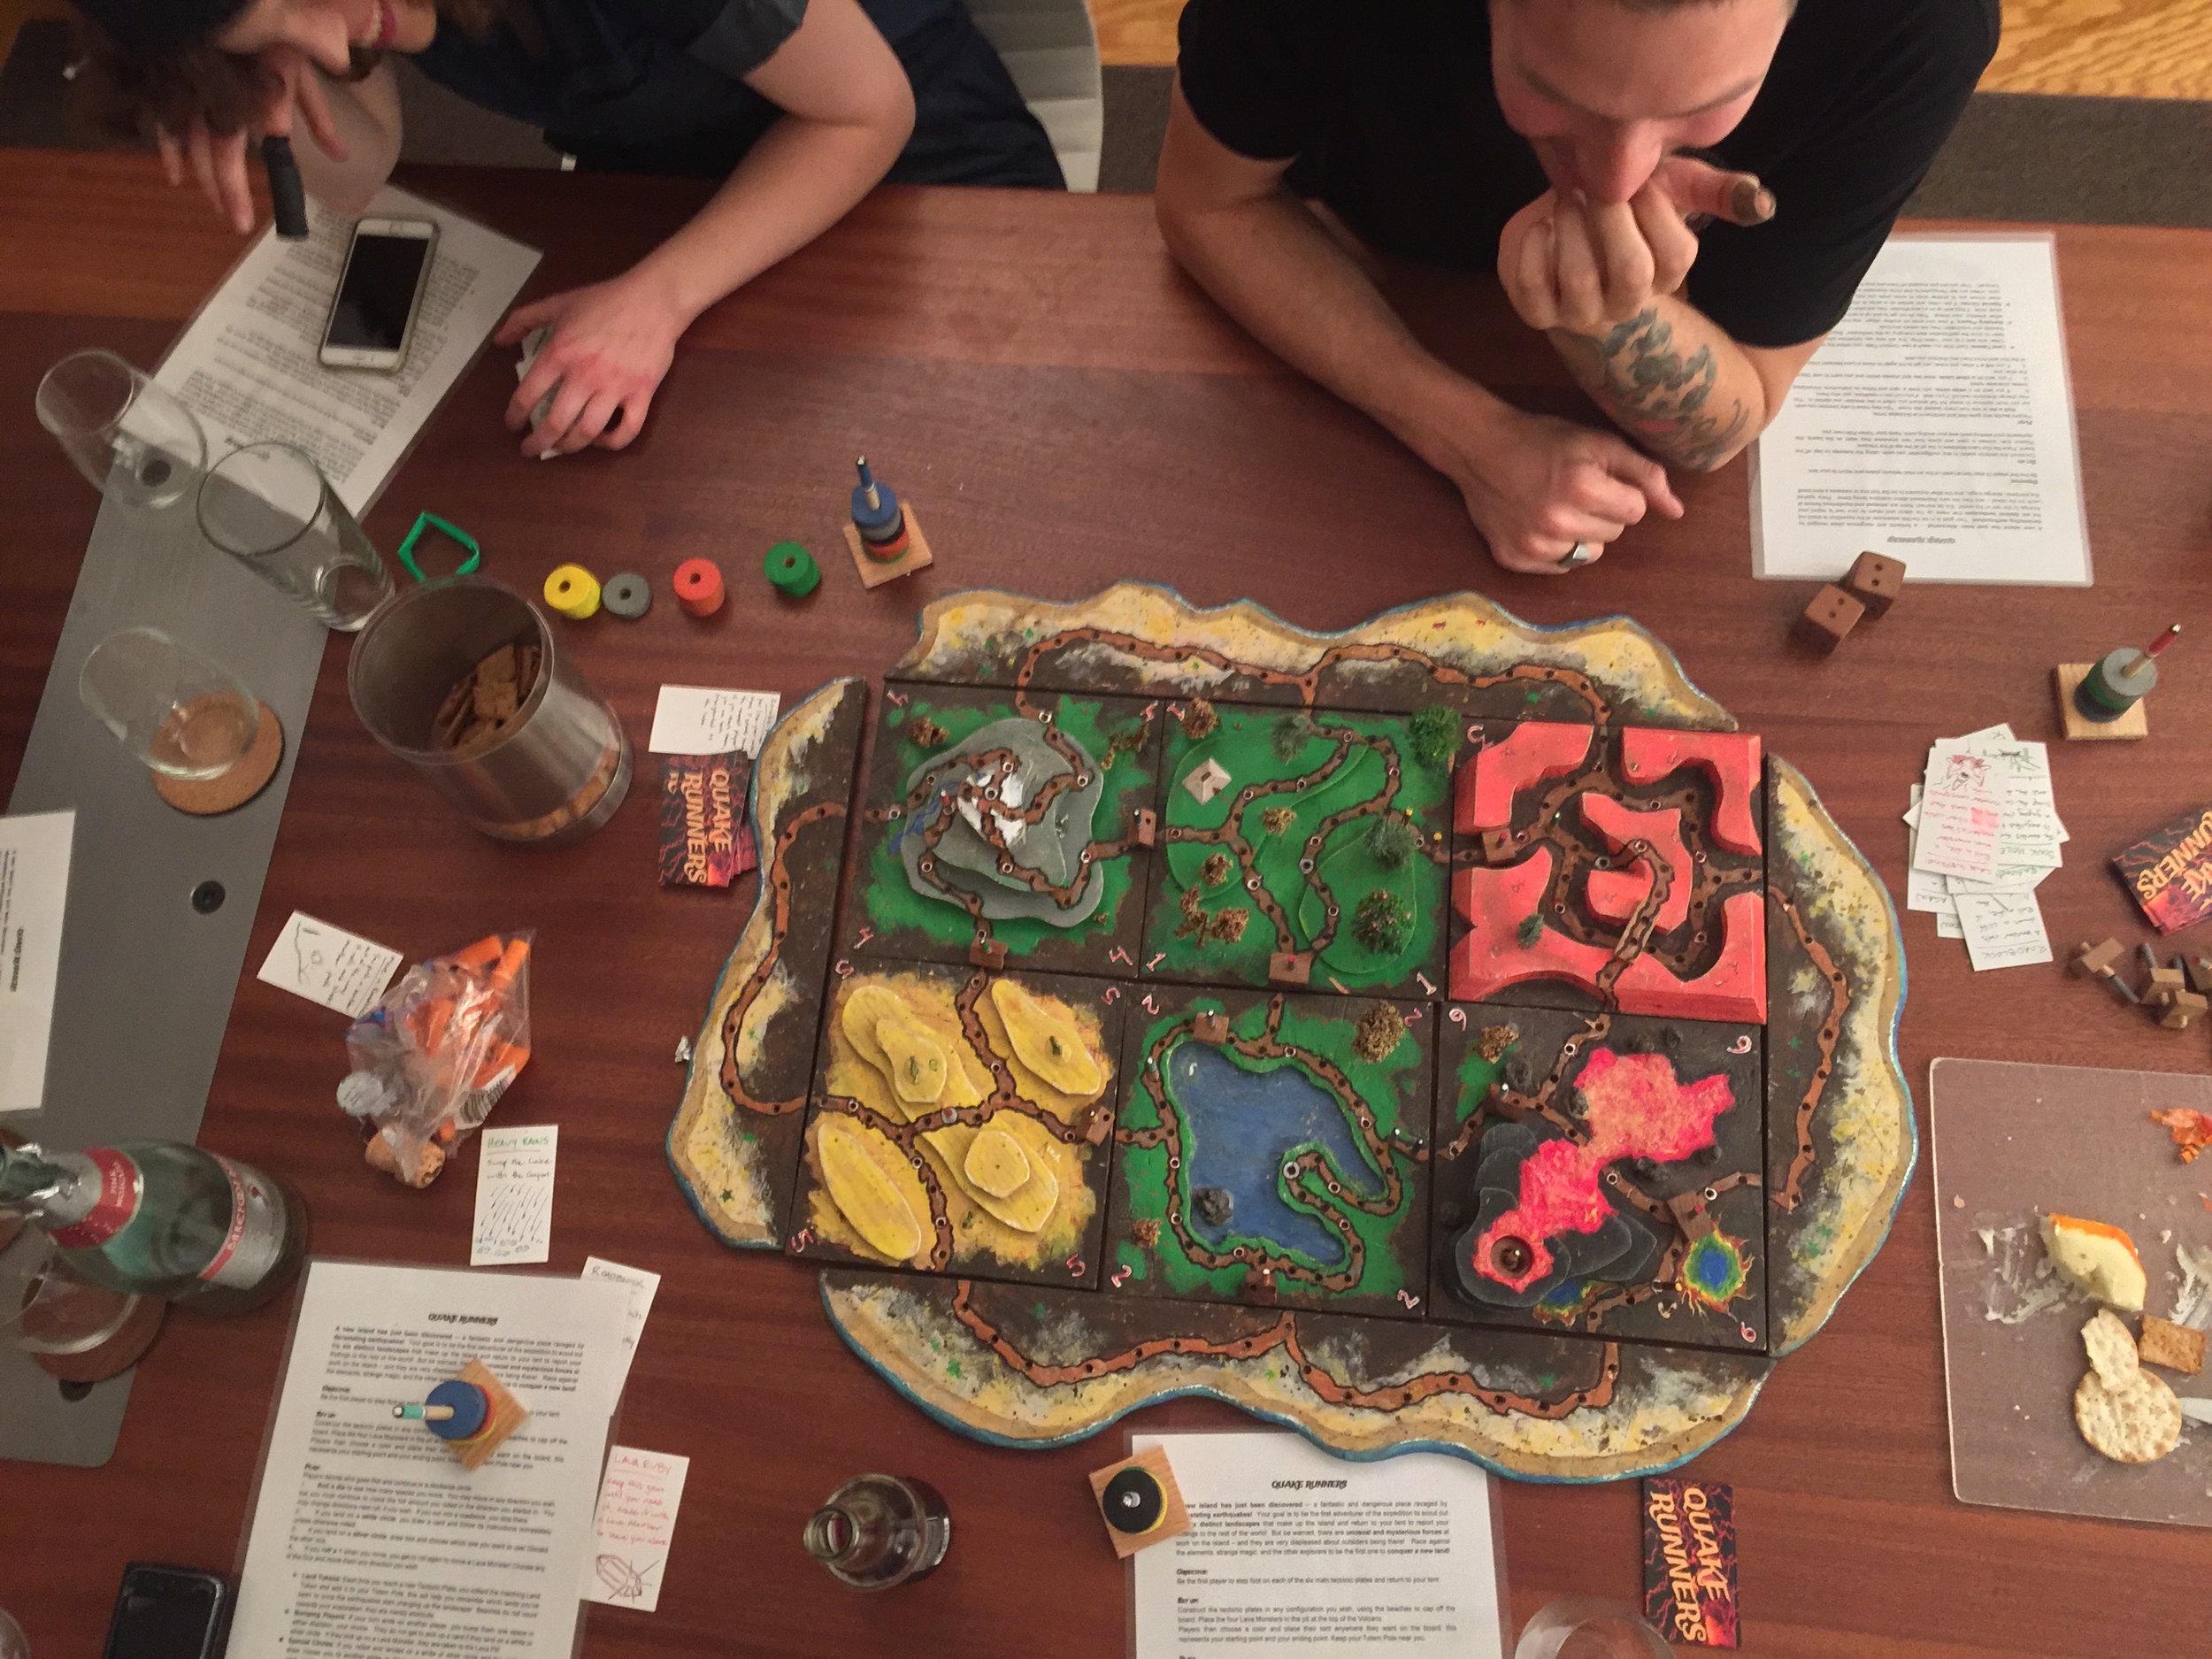 quakerrunners_kean_keaneggett_boardgame_game.jpeg